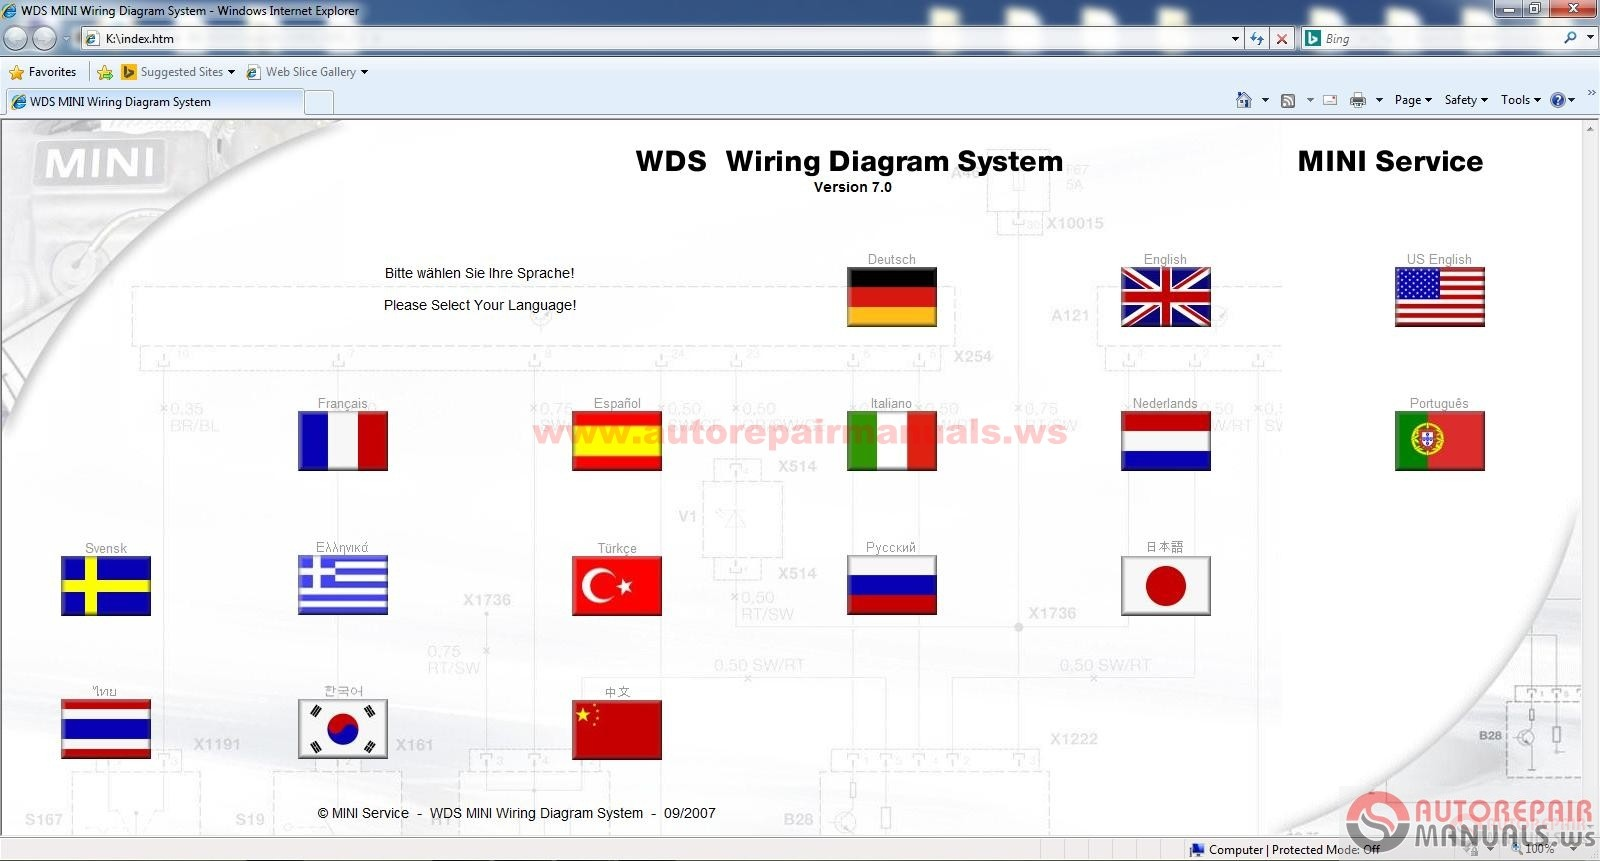 bmw e36 seat wiring diagram bmw e30 wiring diagrams wiring BMW Factory Wiring Diagrams BMW E39 Diagram